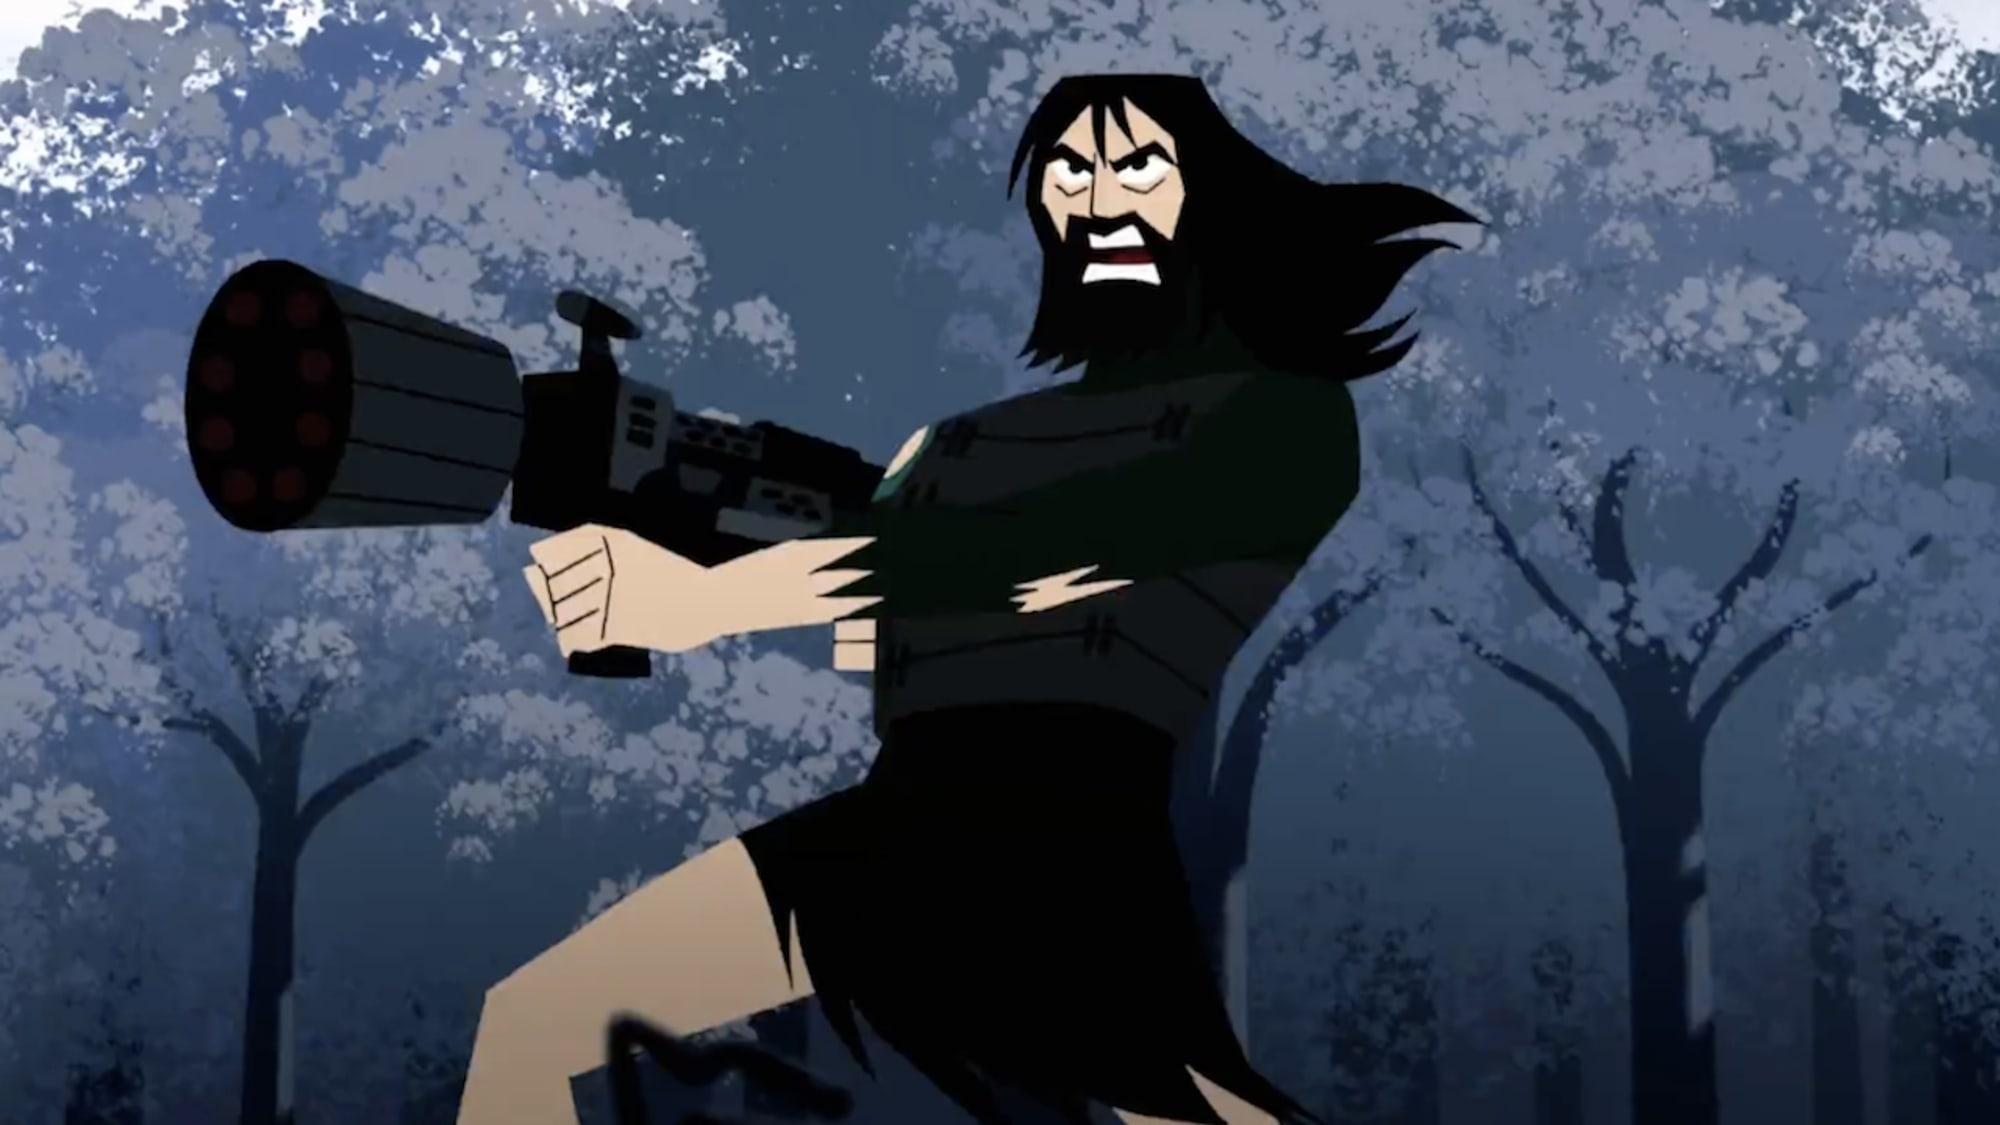 Samurai Jack season 5 episode 5 review: Ashi discovers the truth